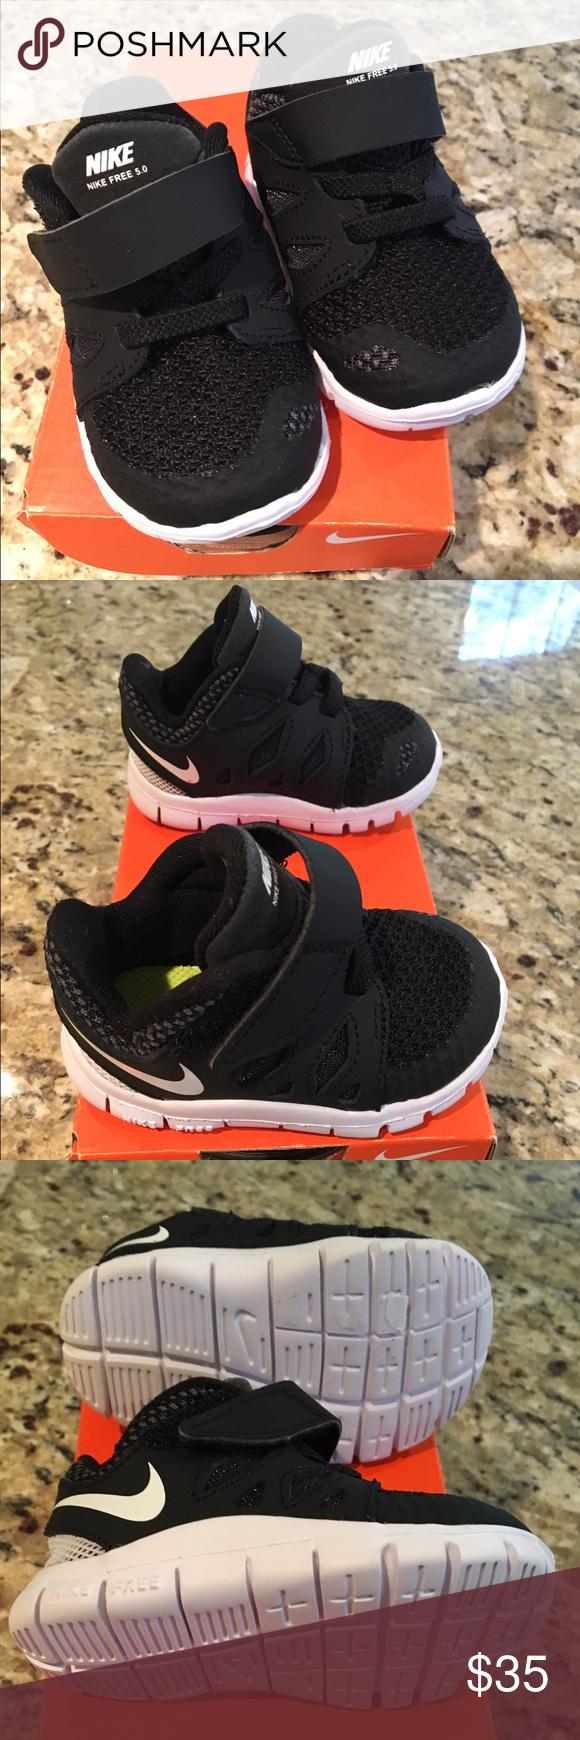 Brand new!!! NIKE baby sneaker FREE NWT Baby sneakers, Black